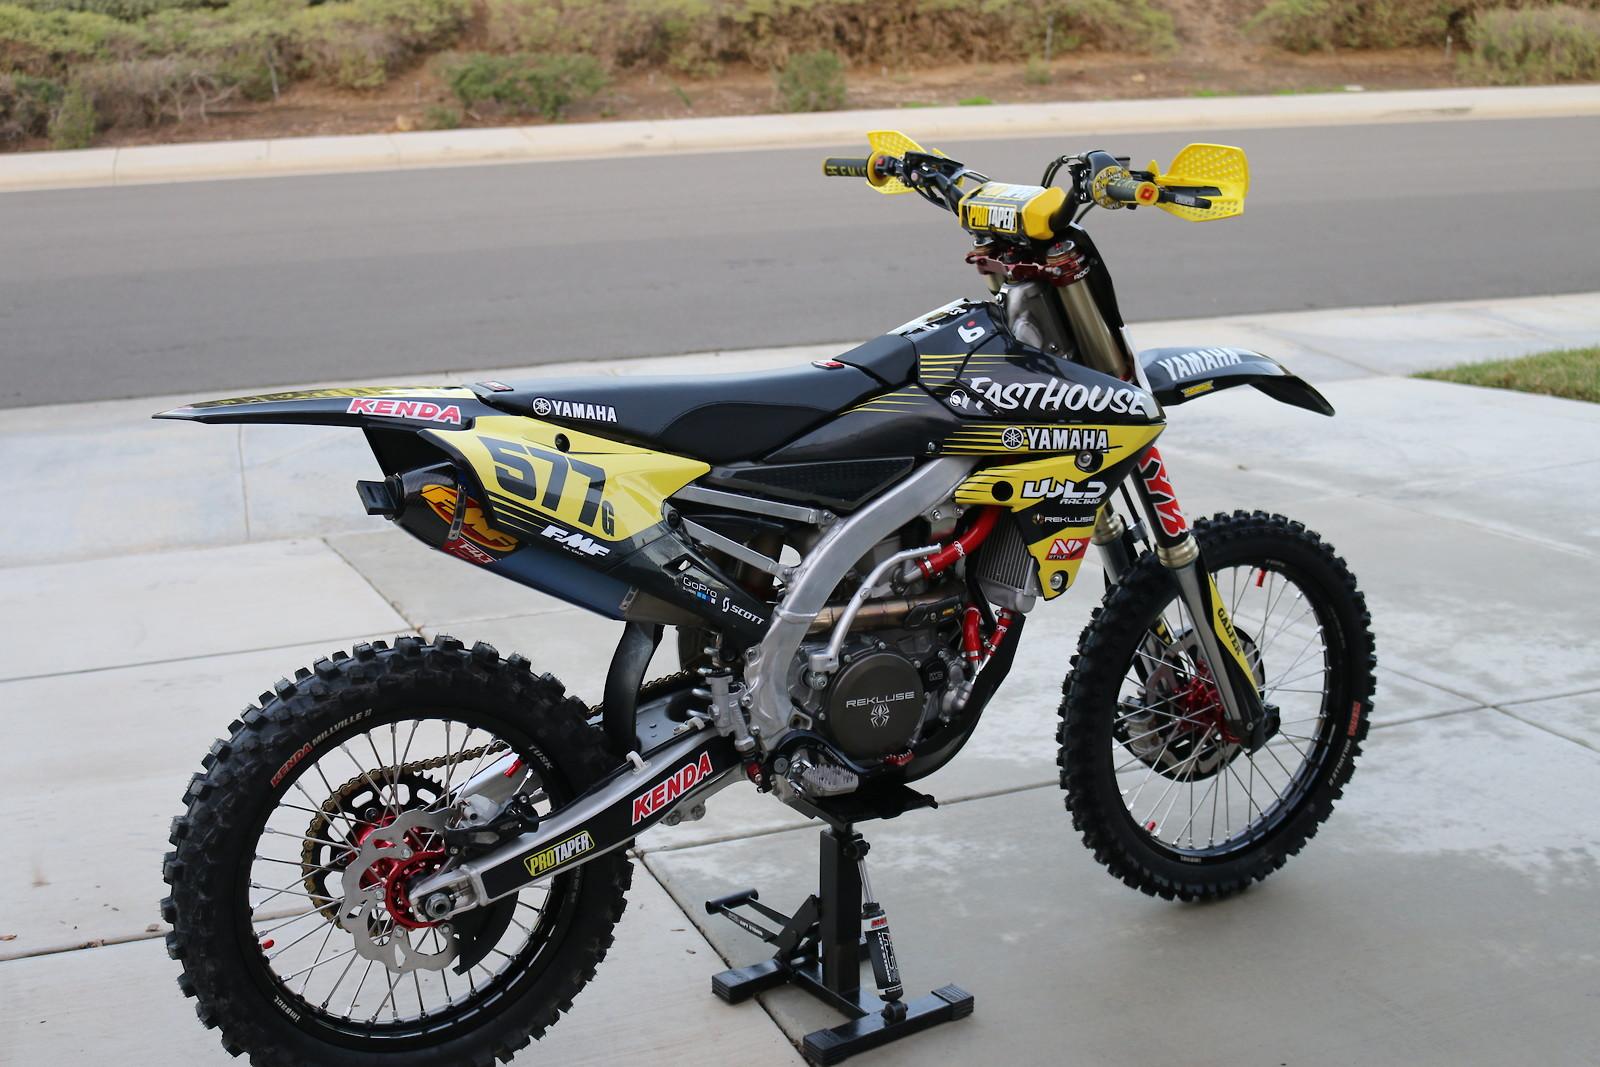 IMG 5898 - WLD - Motocross Pictures - Vital MX